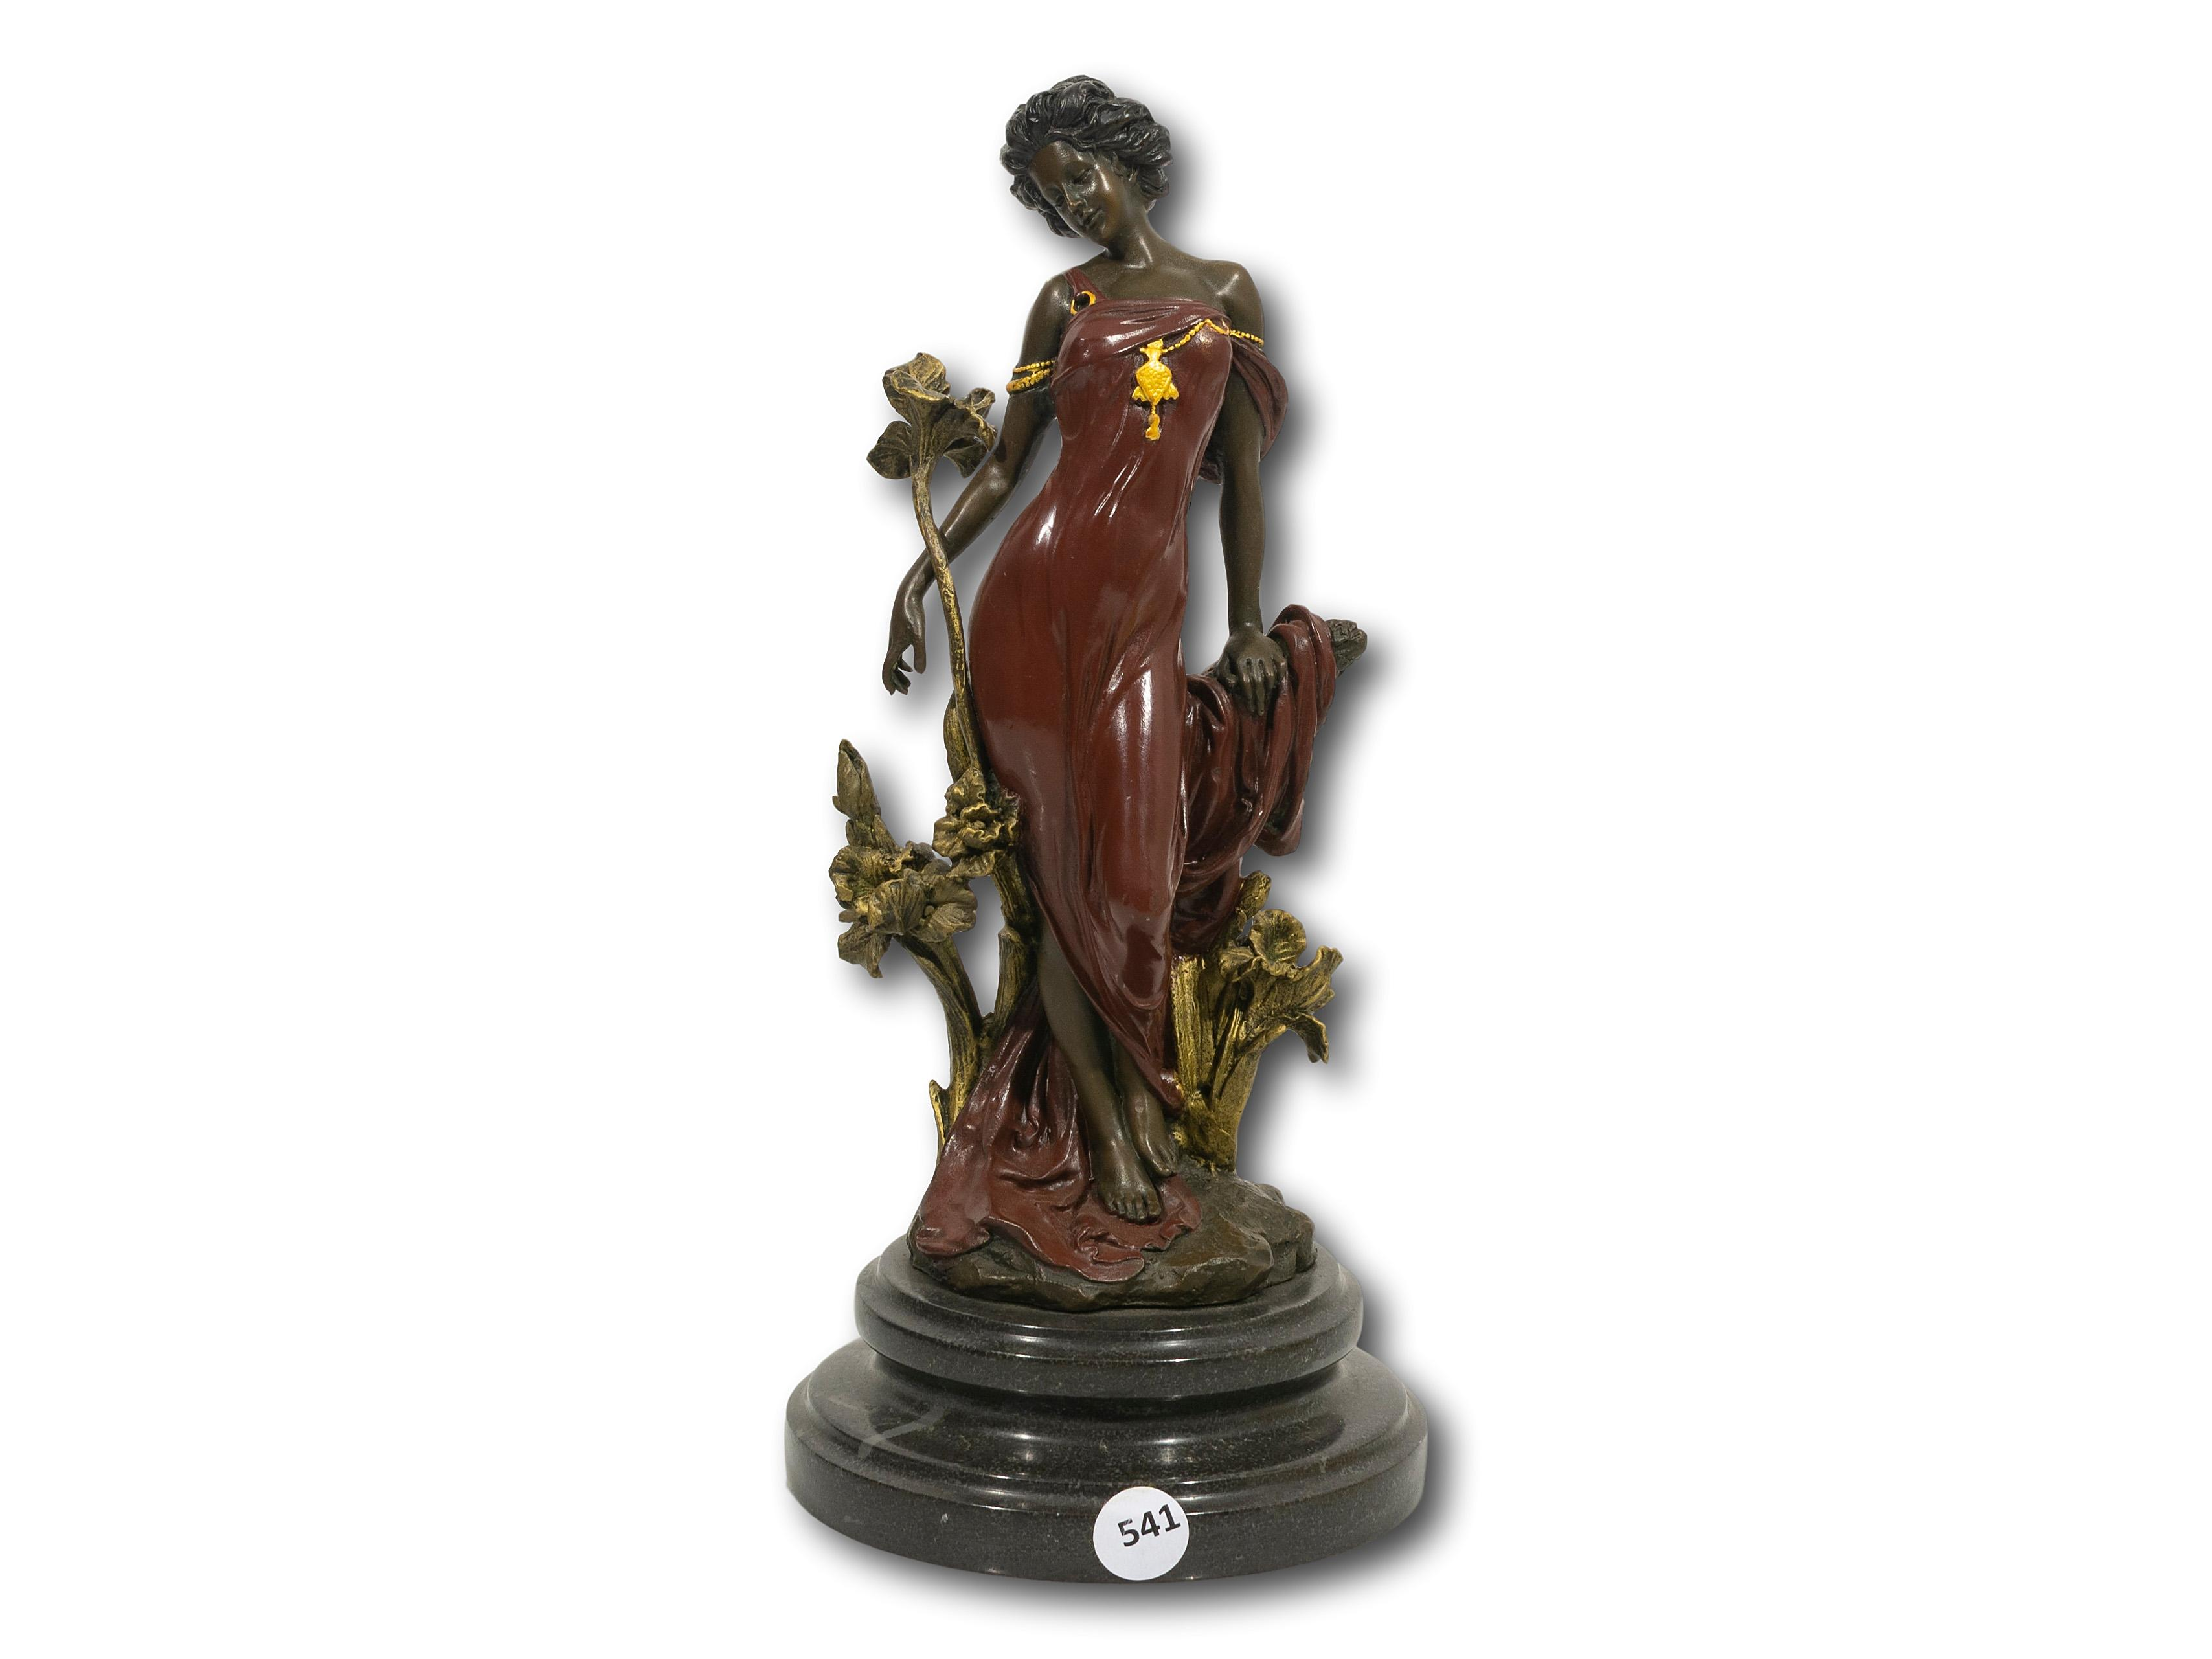 A Bronze of a Classical Female Figurine, Signed 'Nick', 31cm including base